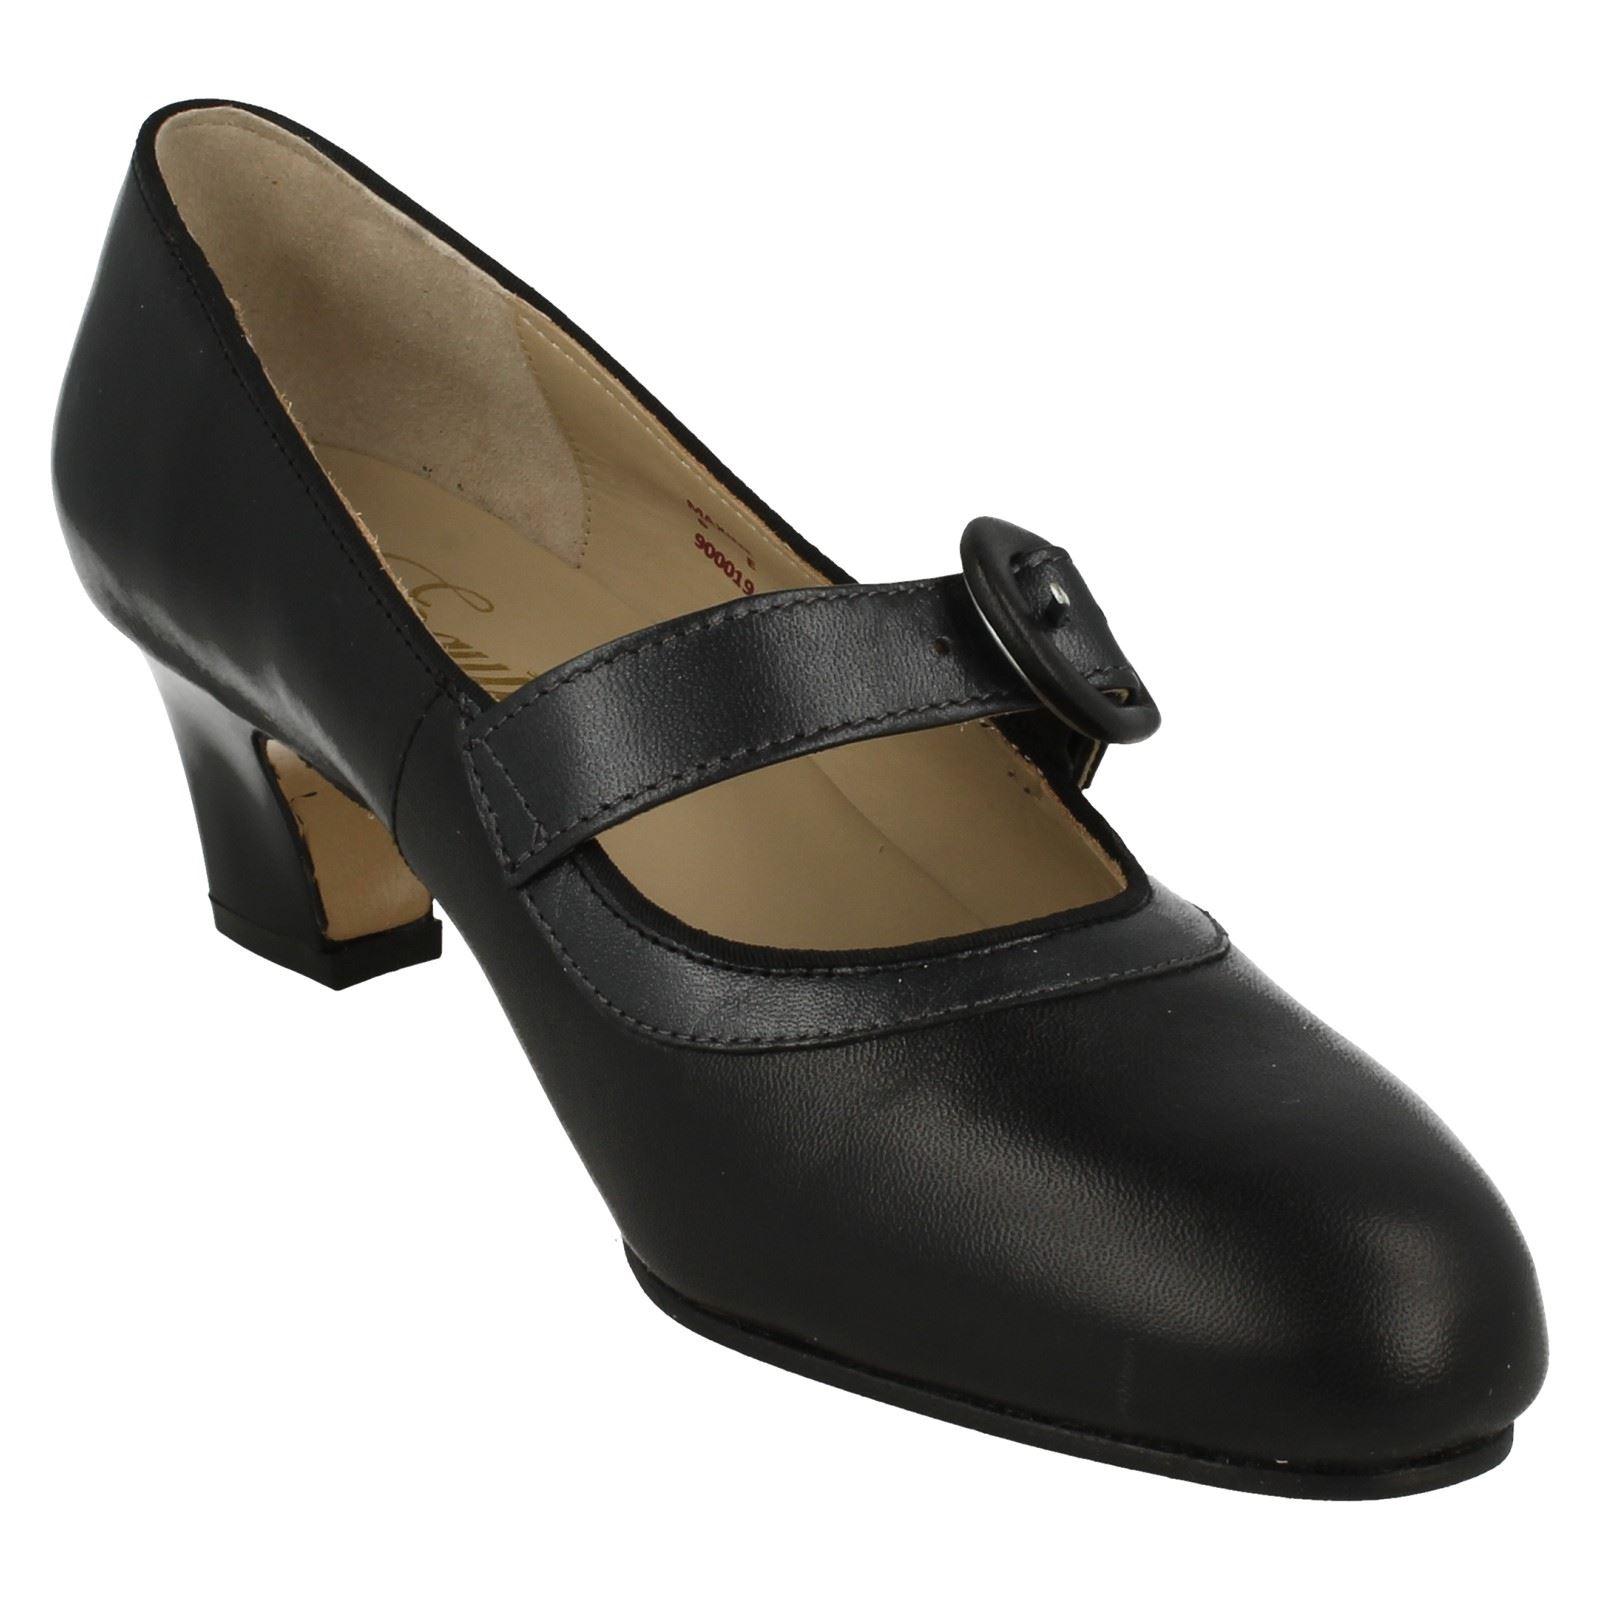 Maxine S Comfort Shoes